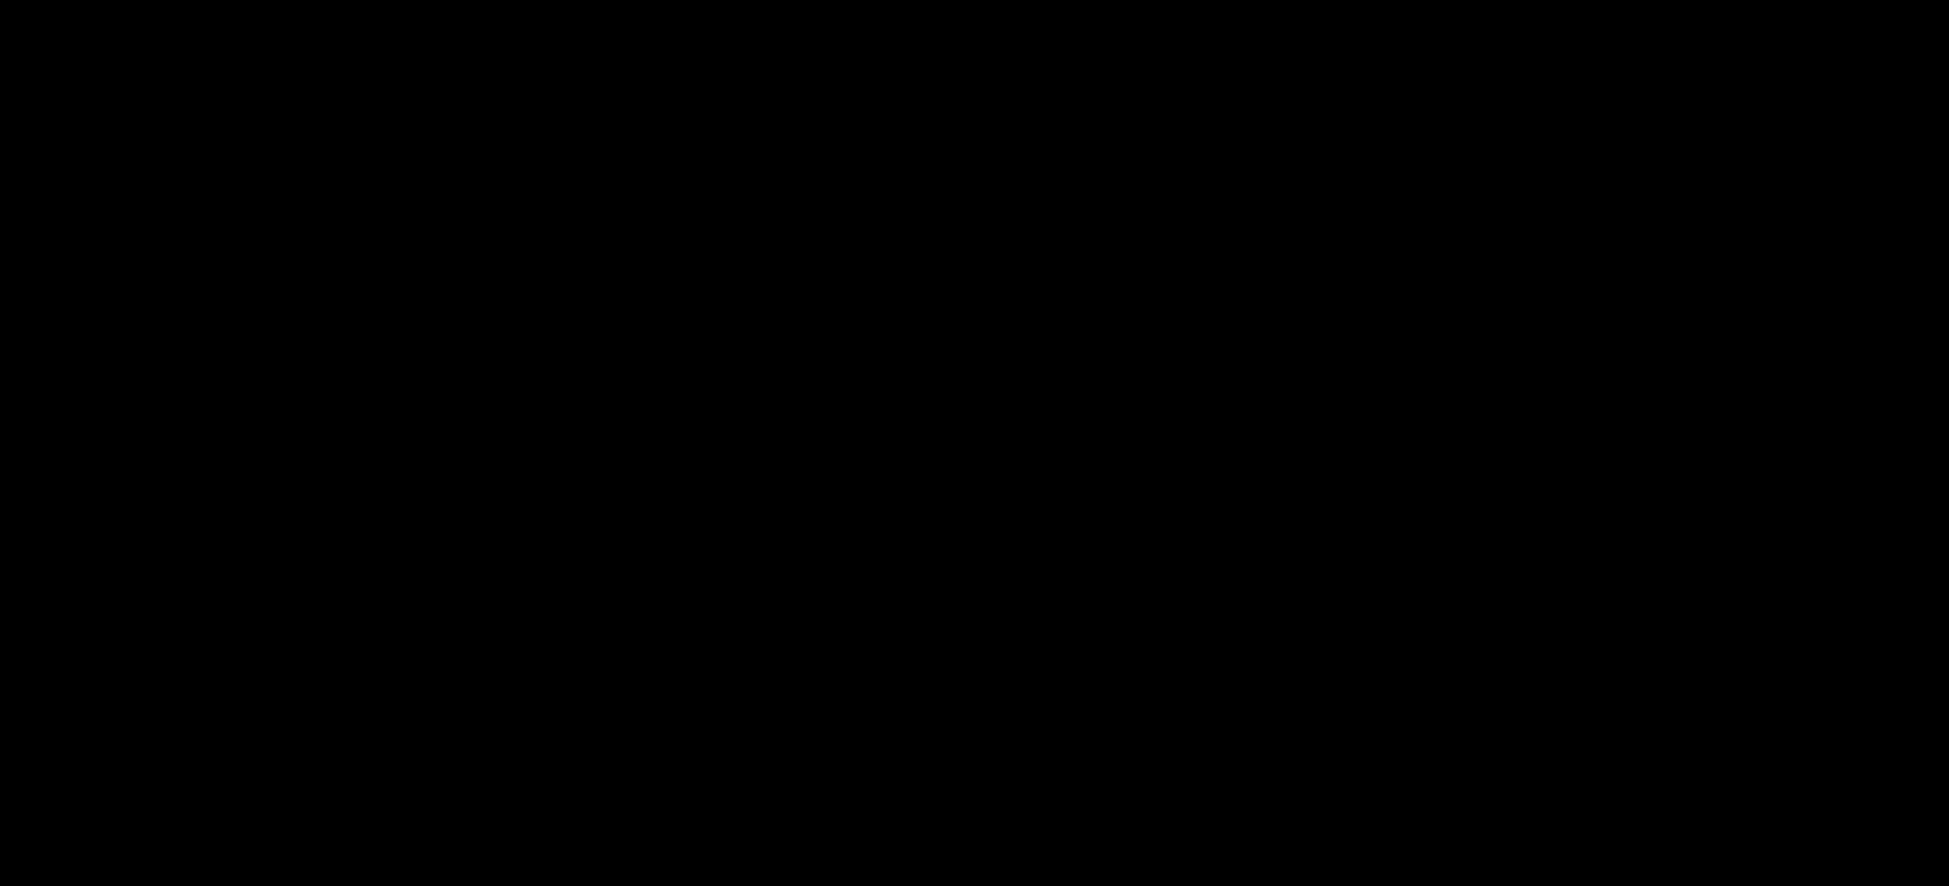 Mr clipart svg. File black wikimedia commons